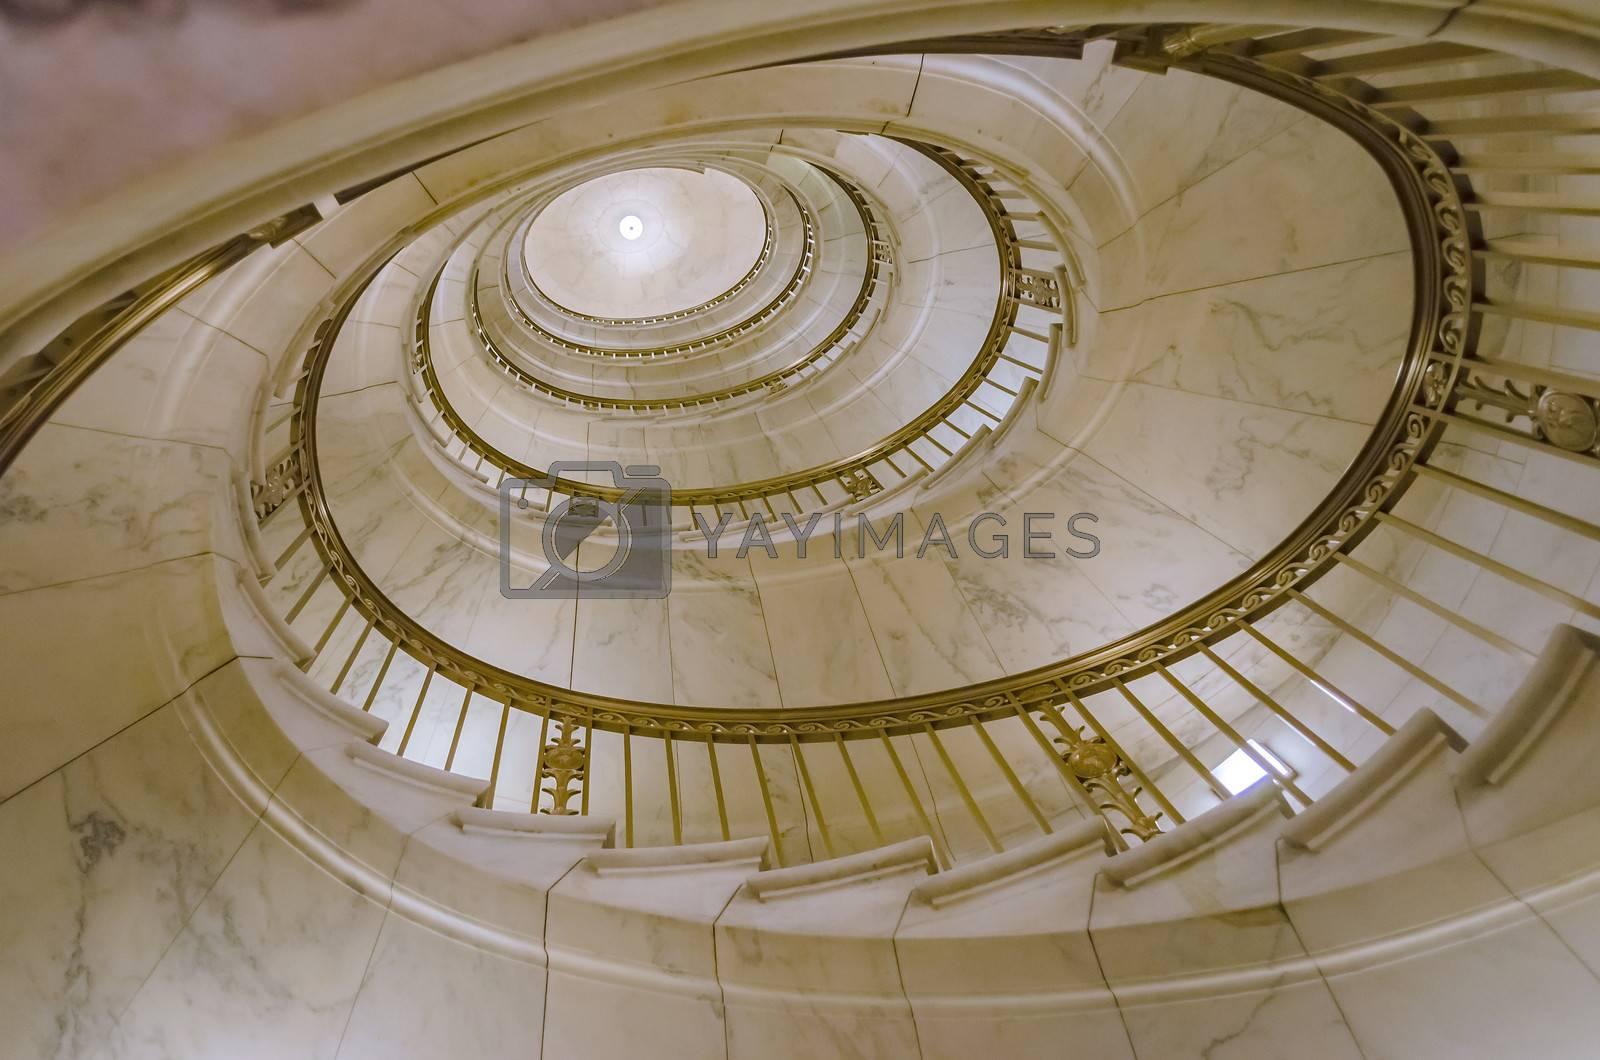 Spiral Staircase, inside Supreme Court, Washington DC, USA